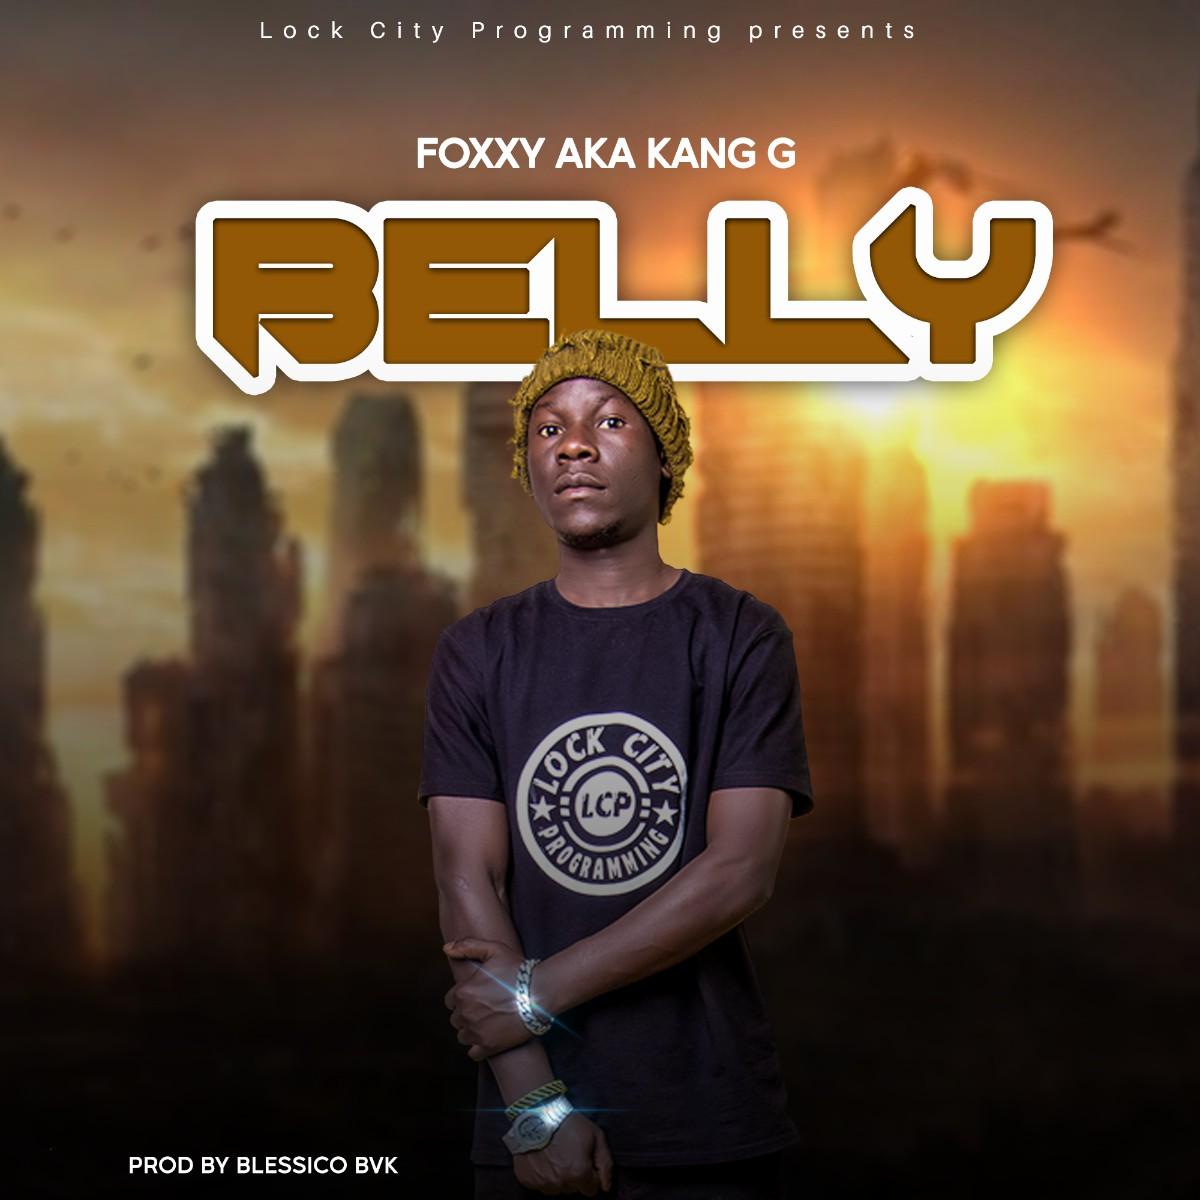 Foxxy AKA Kang G - Belly